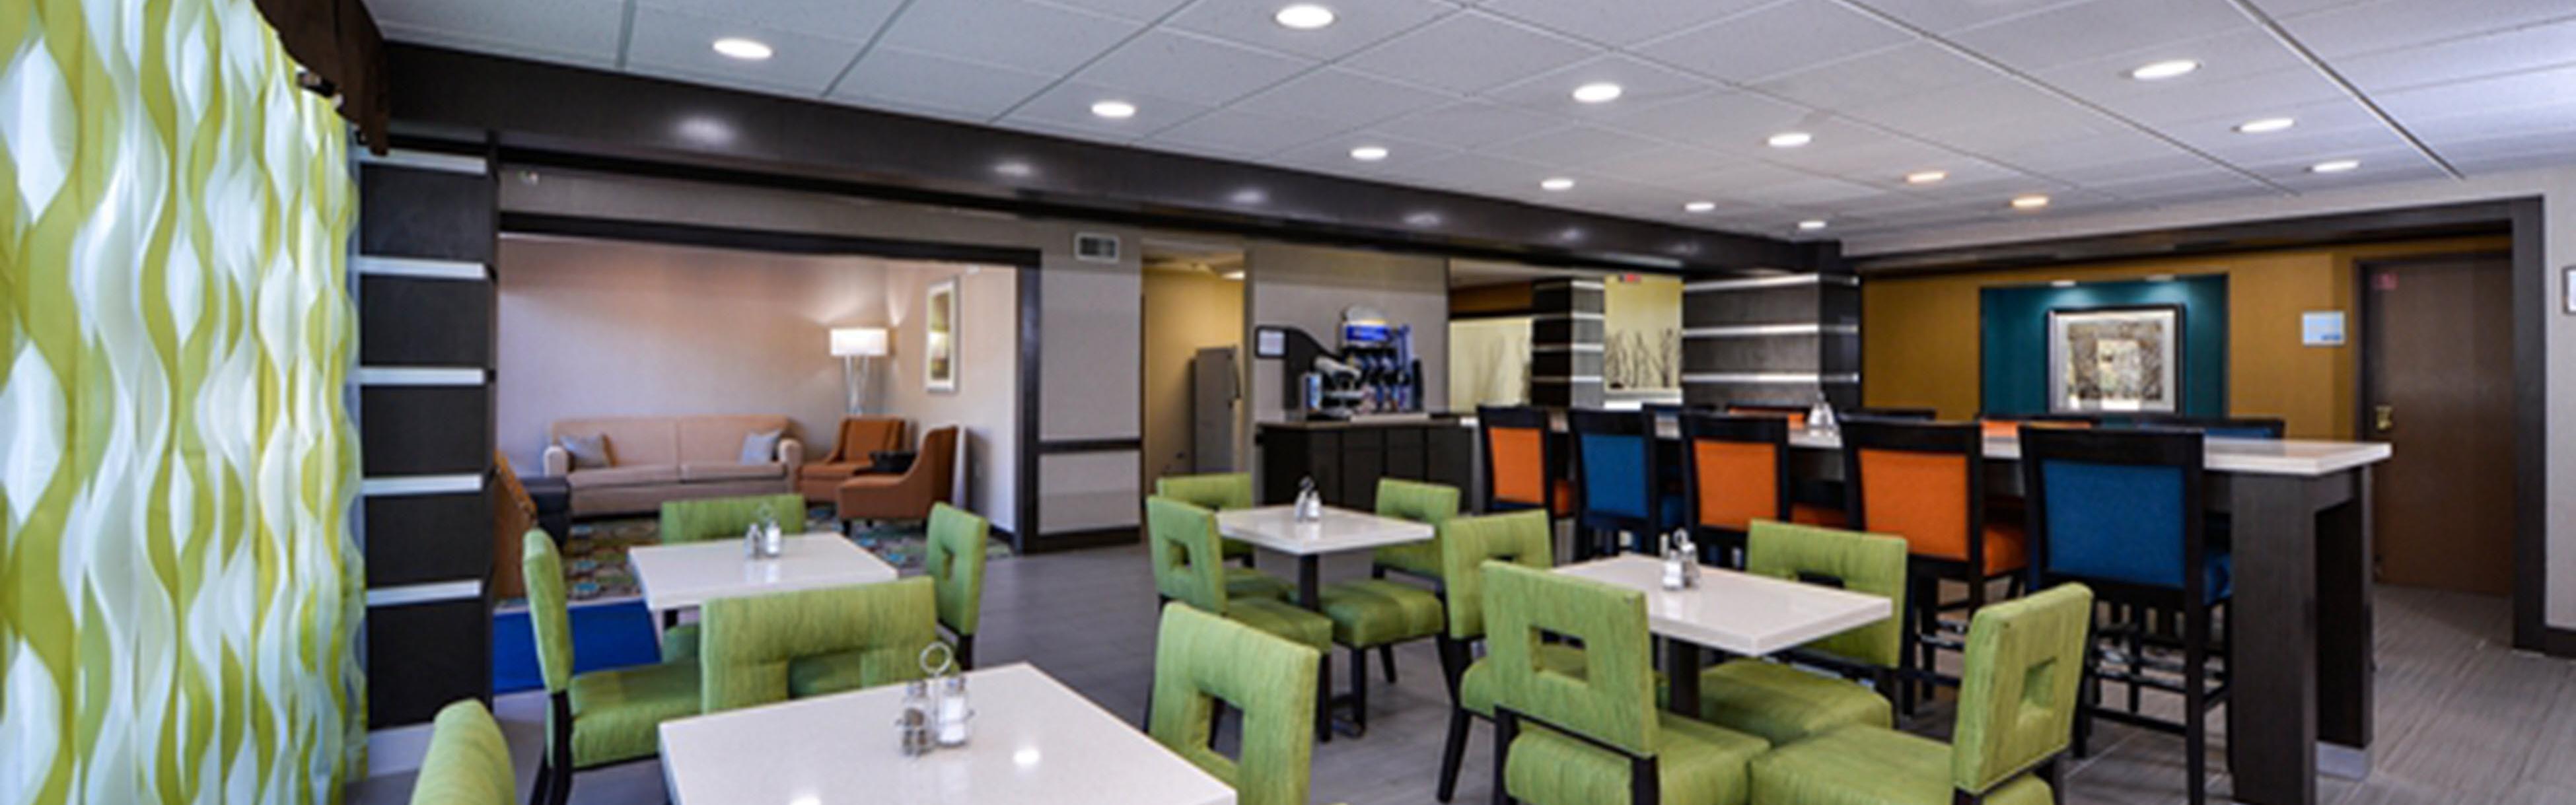 Hotels Near Kingwood Medical Center